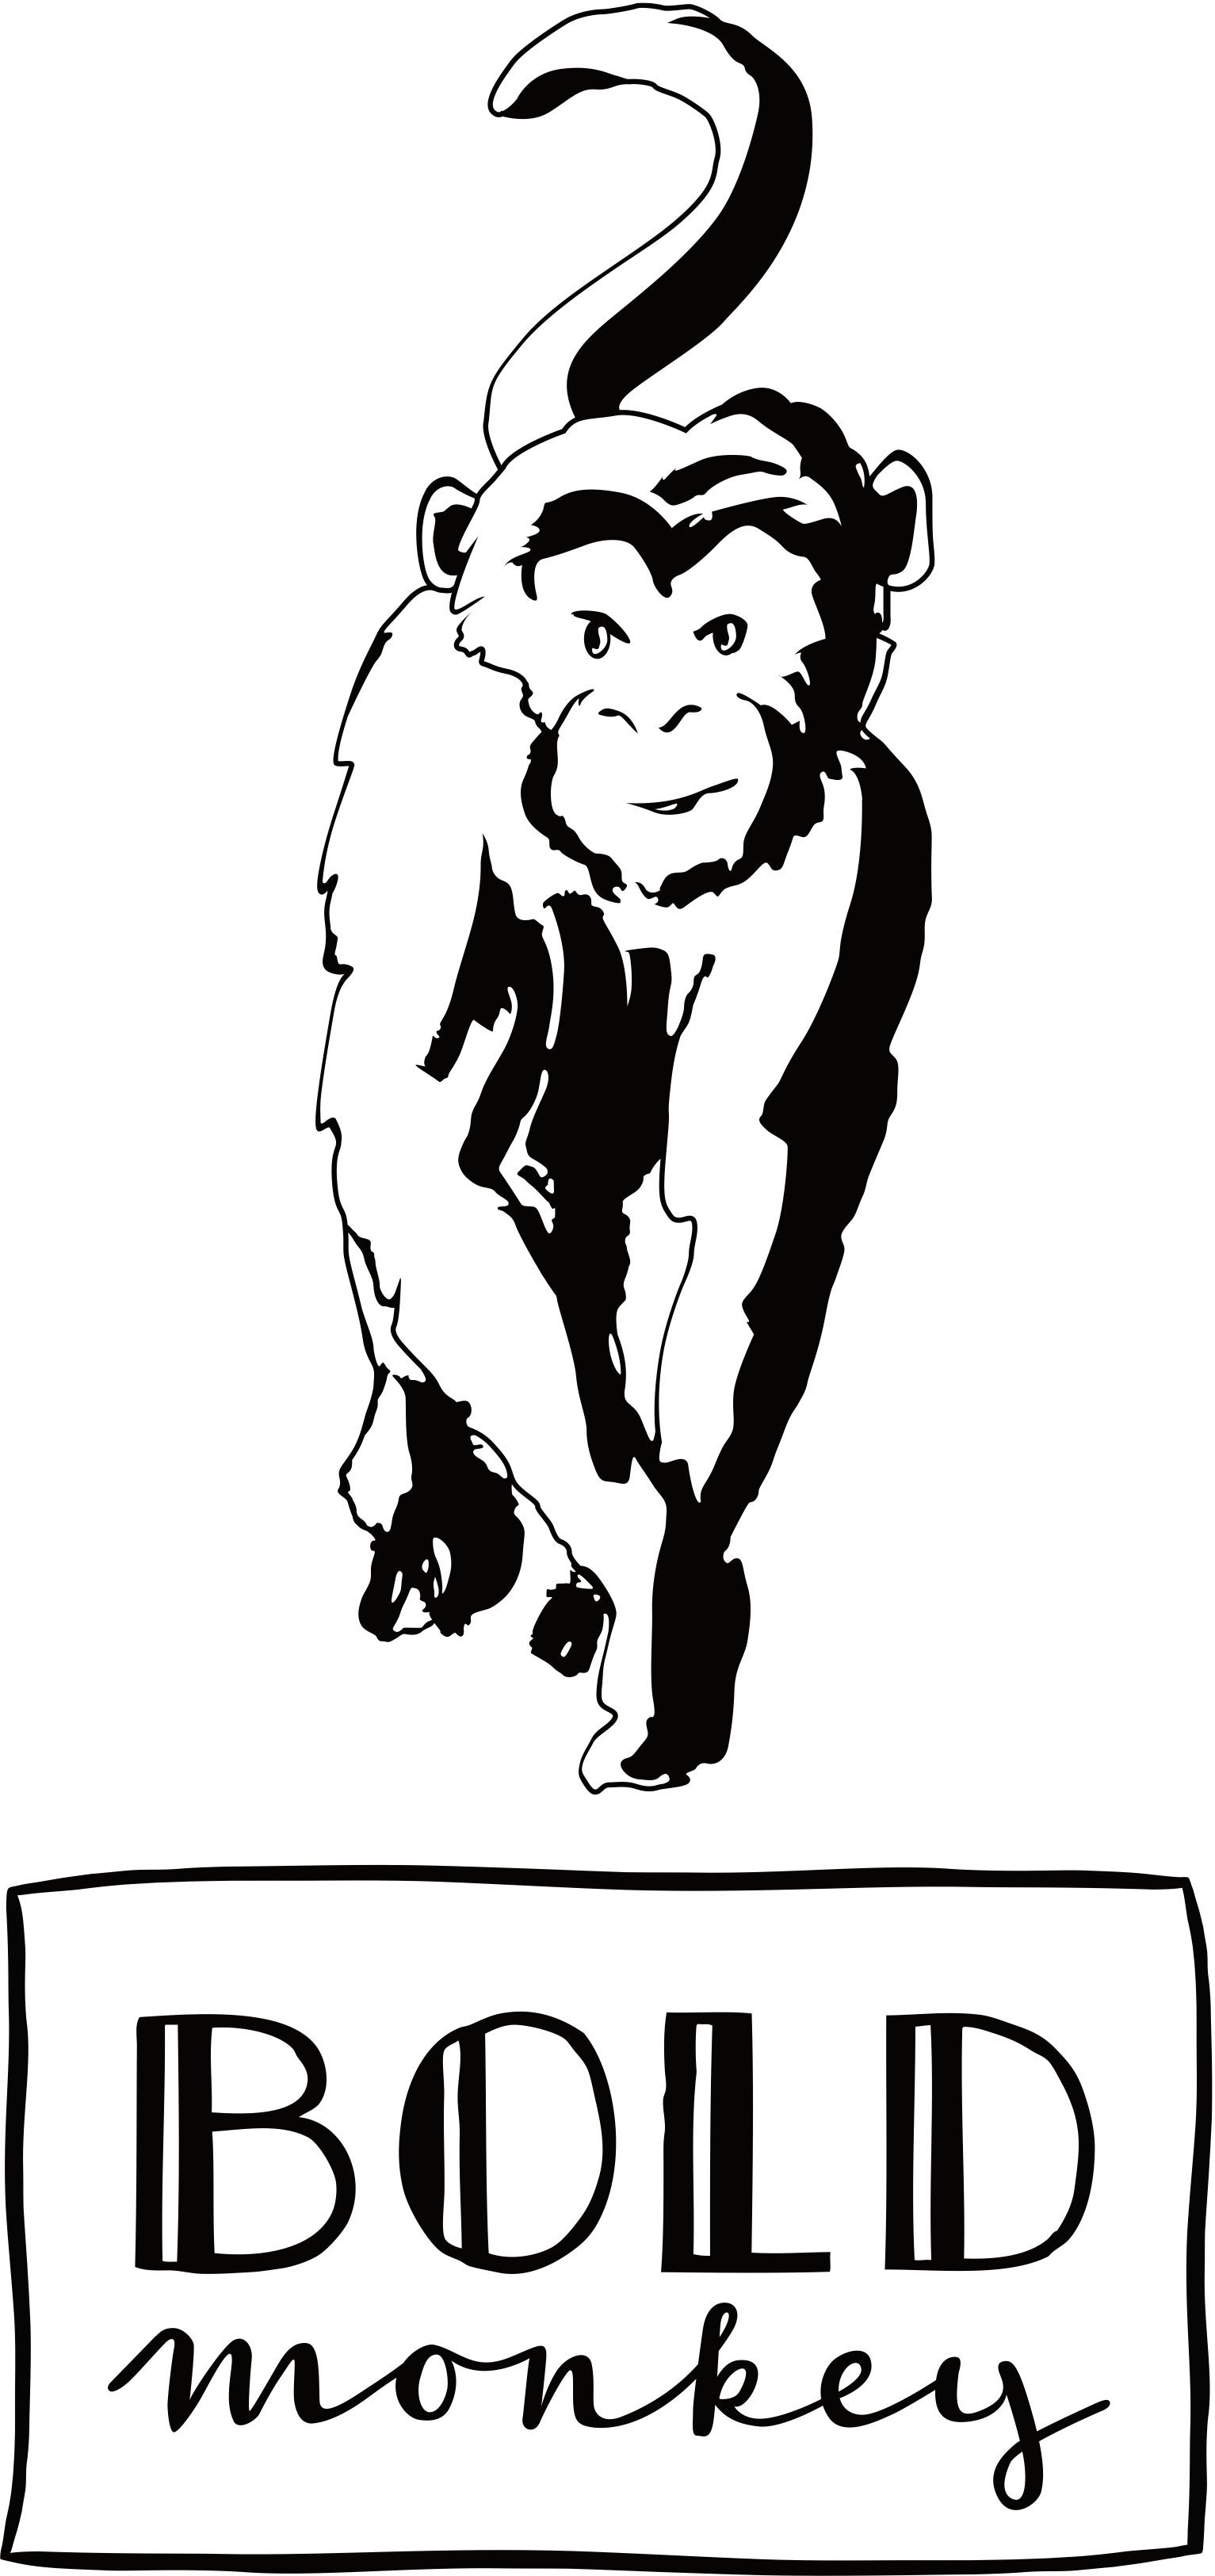 Bold Monkey I am not a croissant bank donker groen velvet gouden poten vooraanzicht